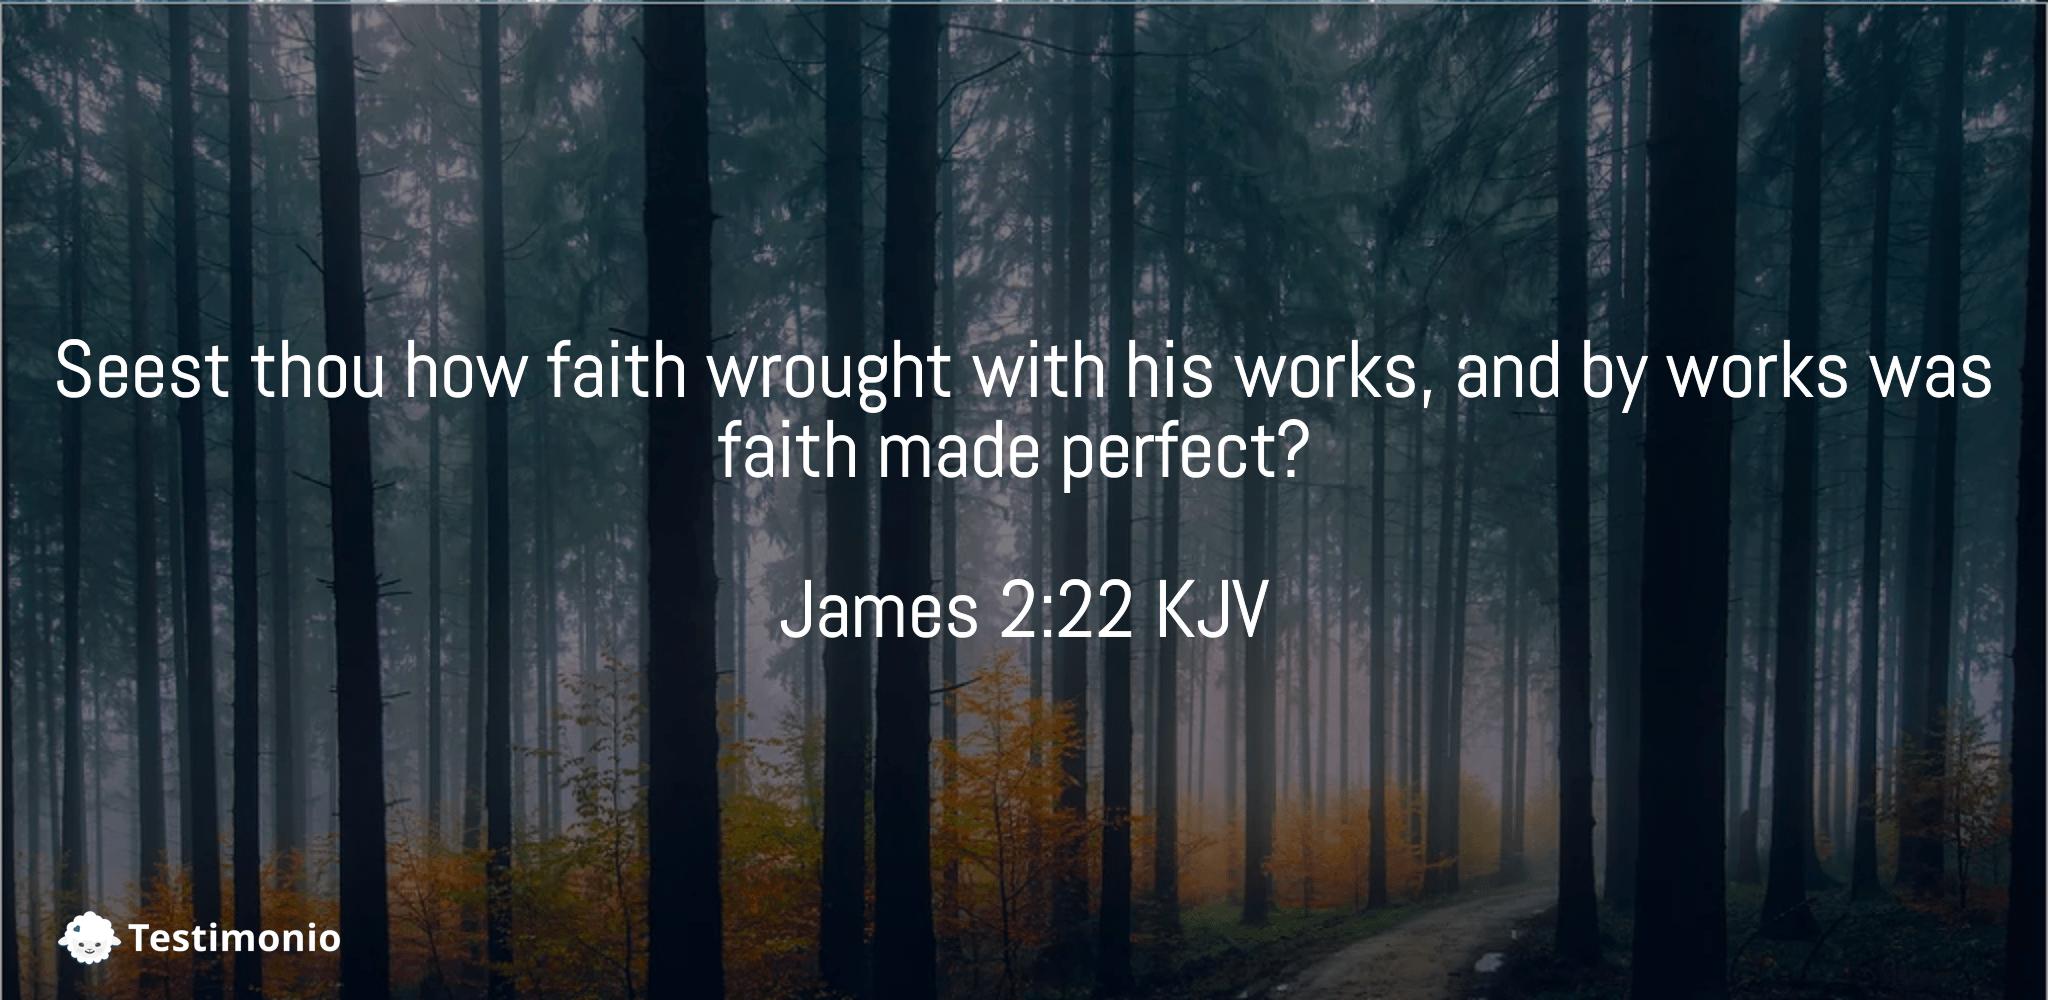 James 2:22